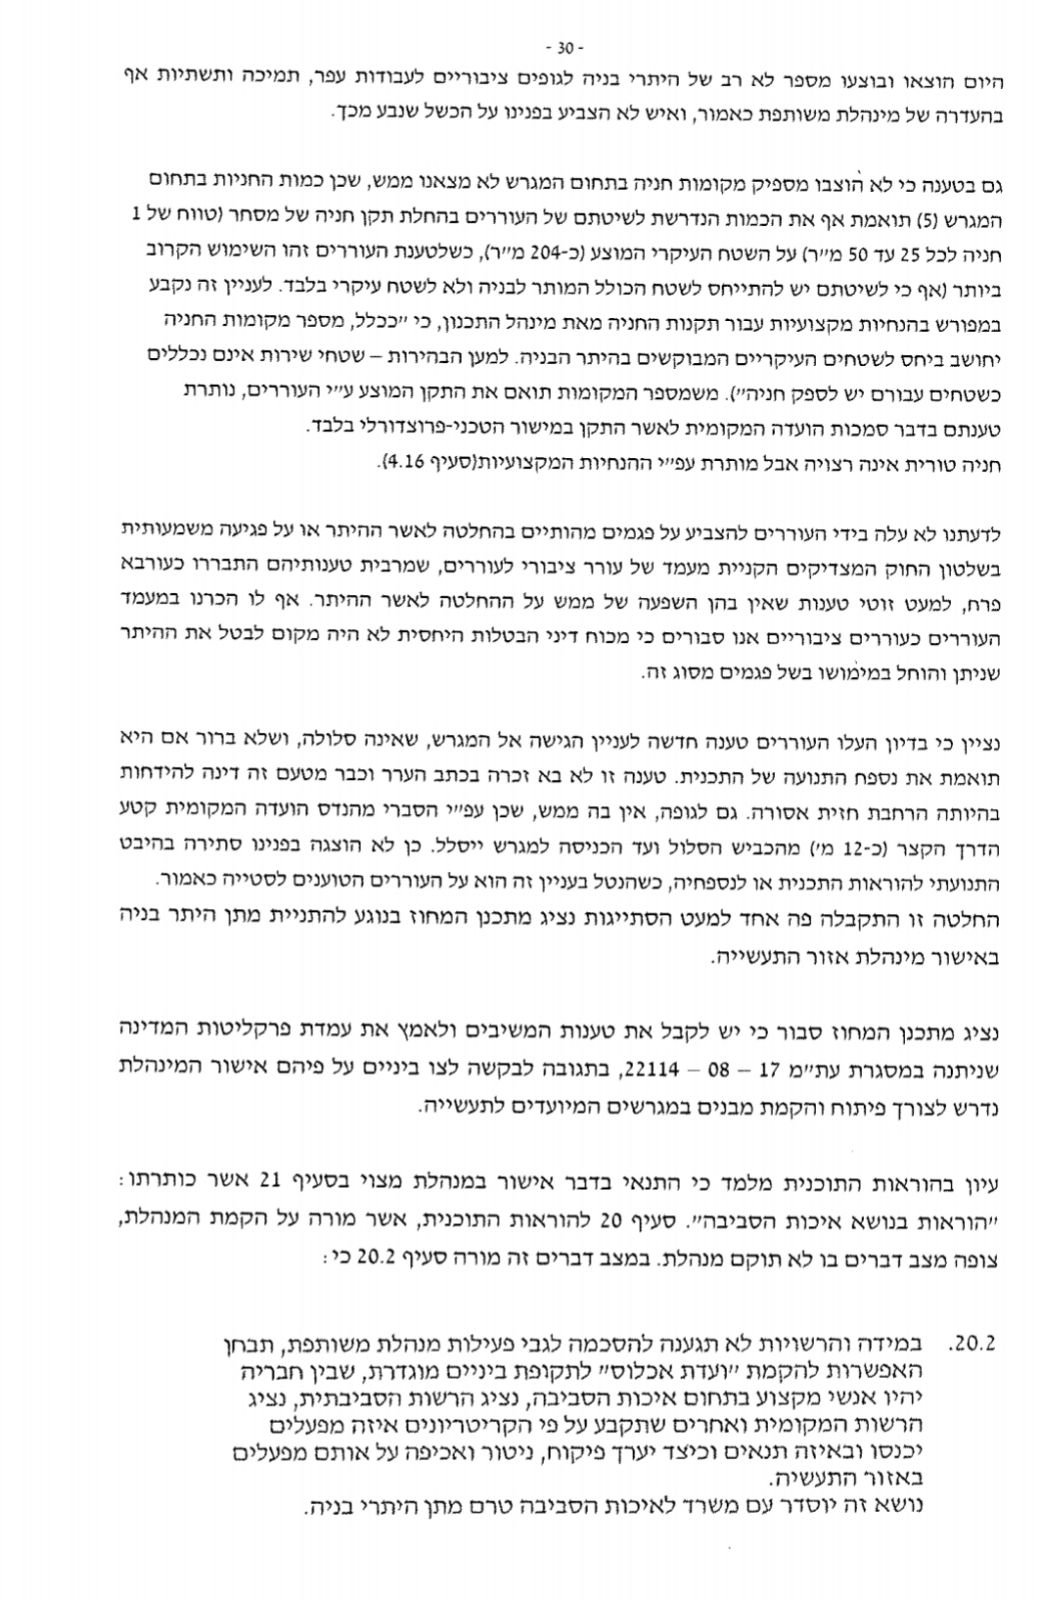 رفض استنئاف 300 مواطن من كفر كنا على قرار قضائي سمح باقامة مركز شرطة